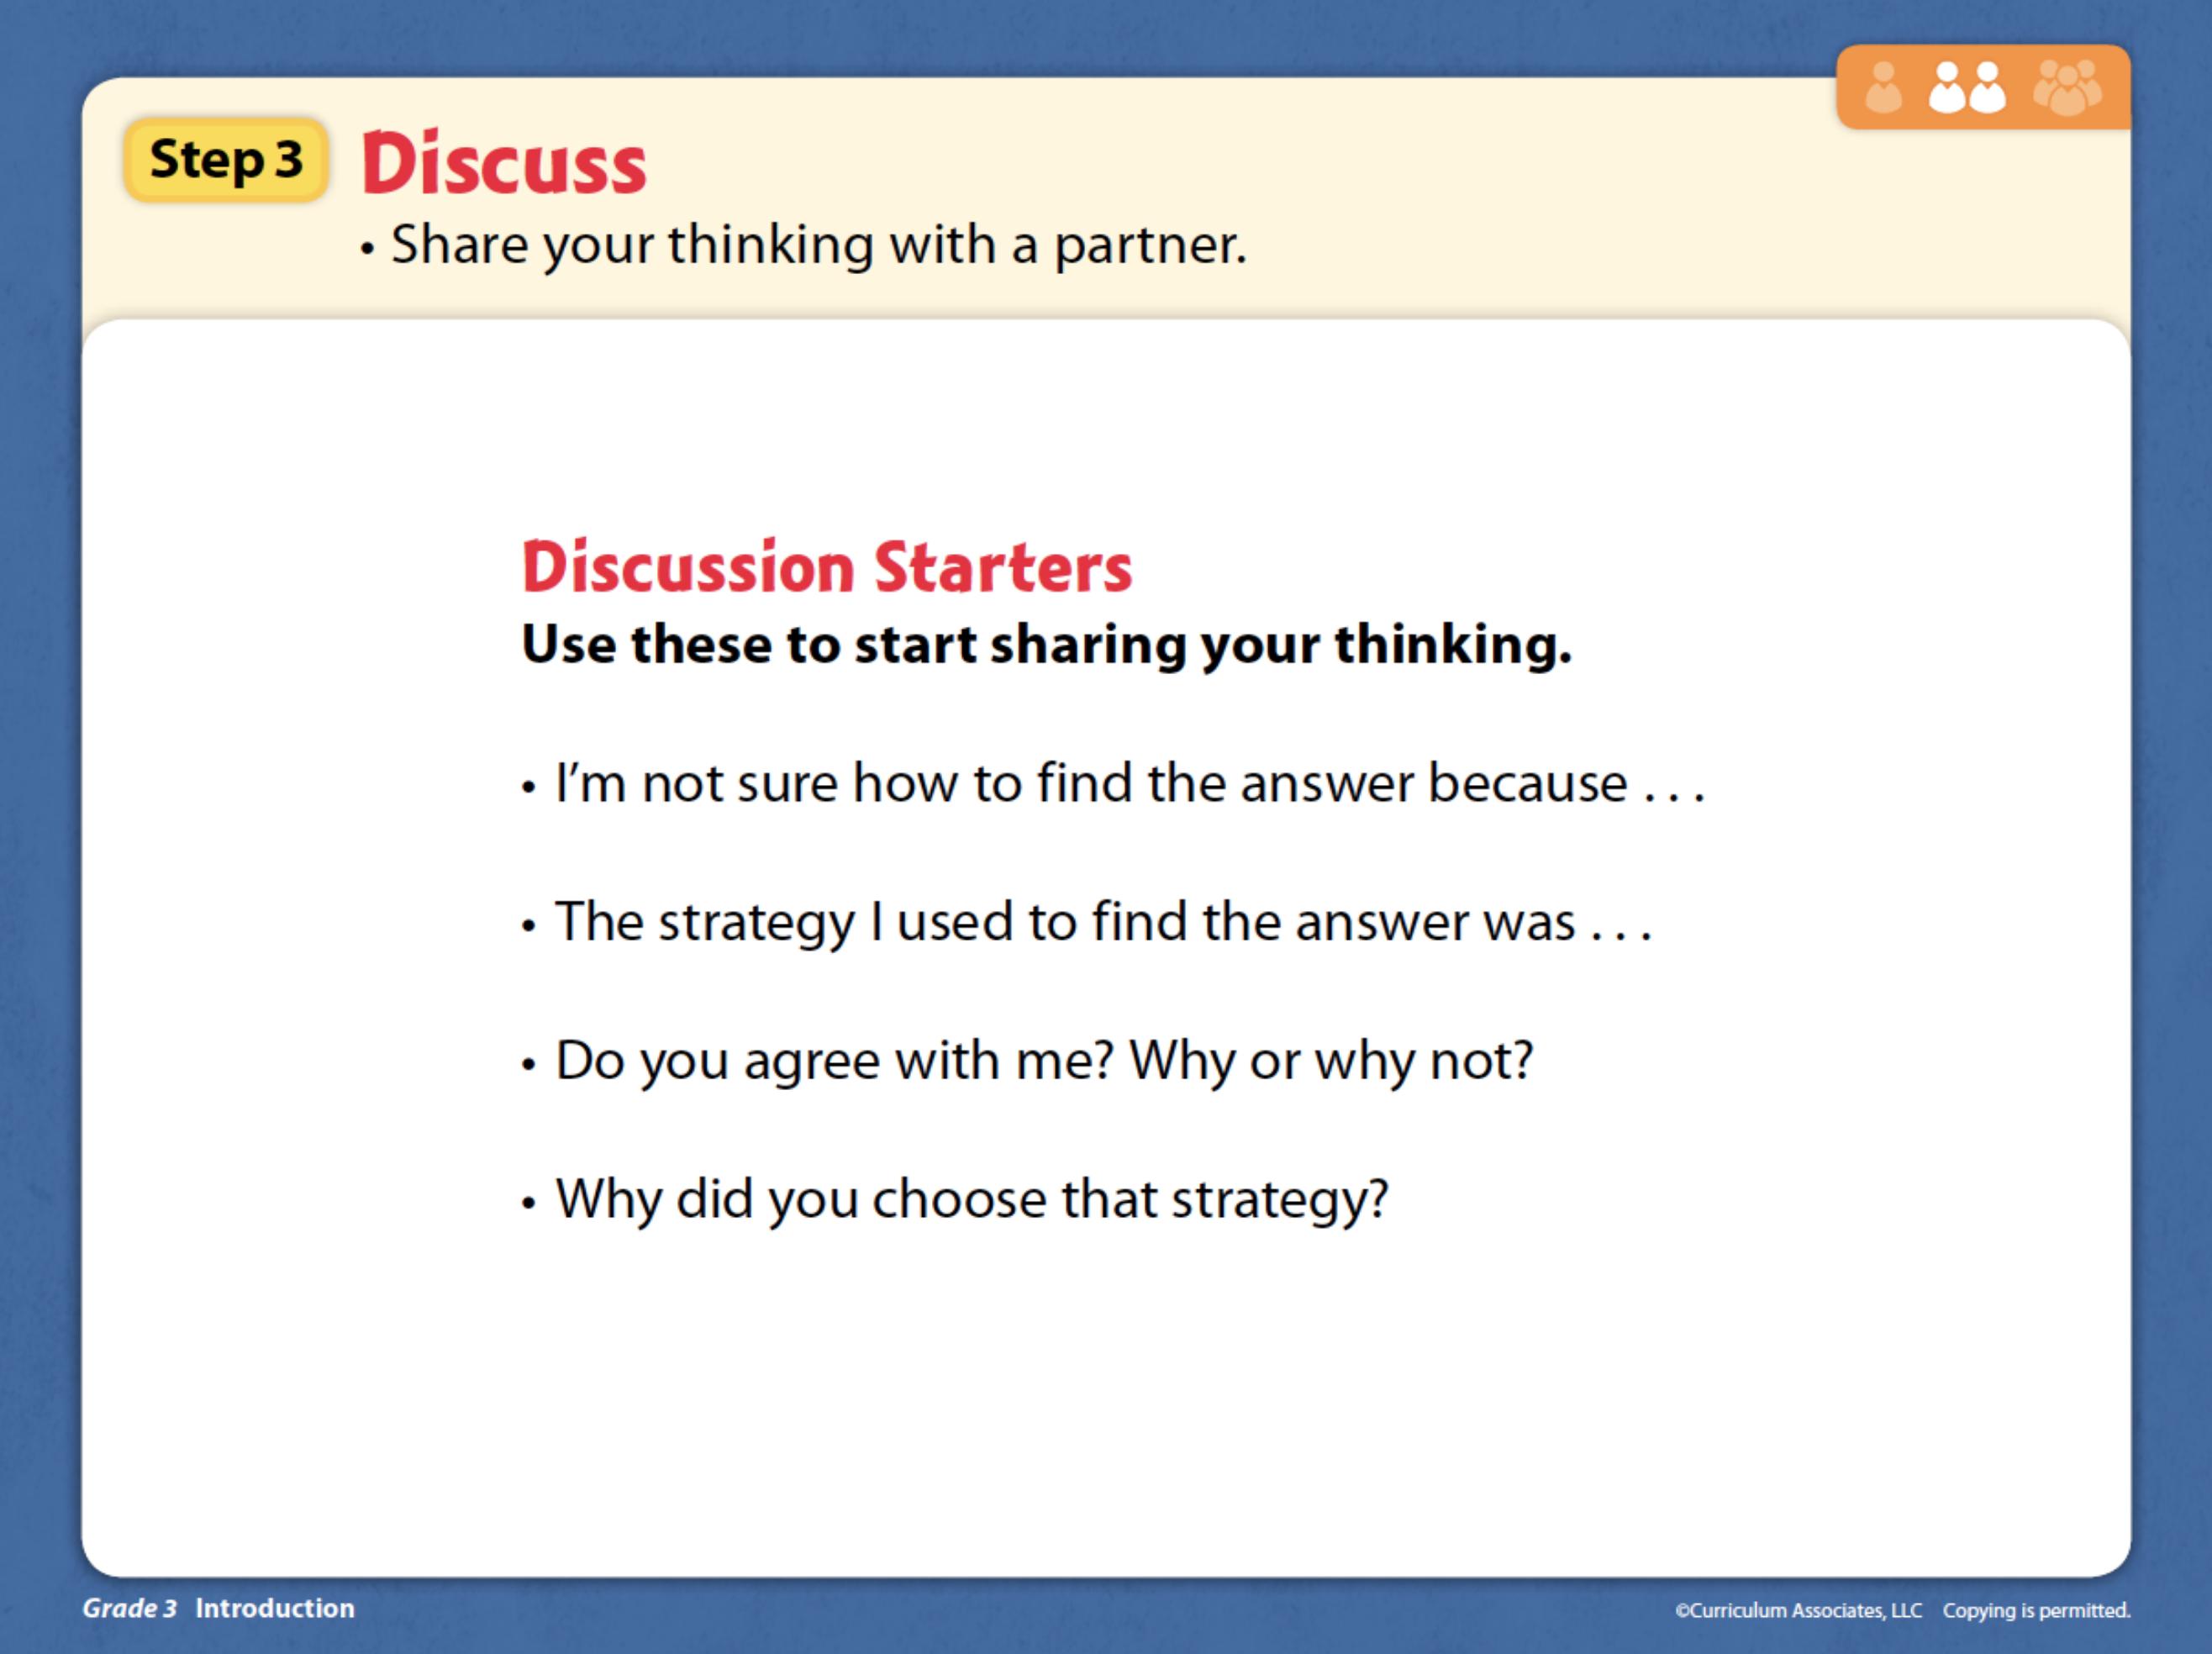 Step 3 Discuss